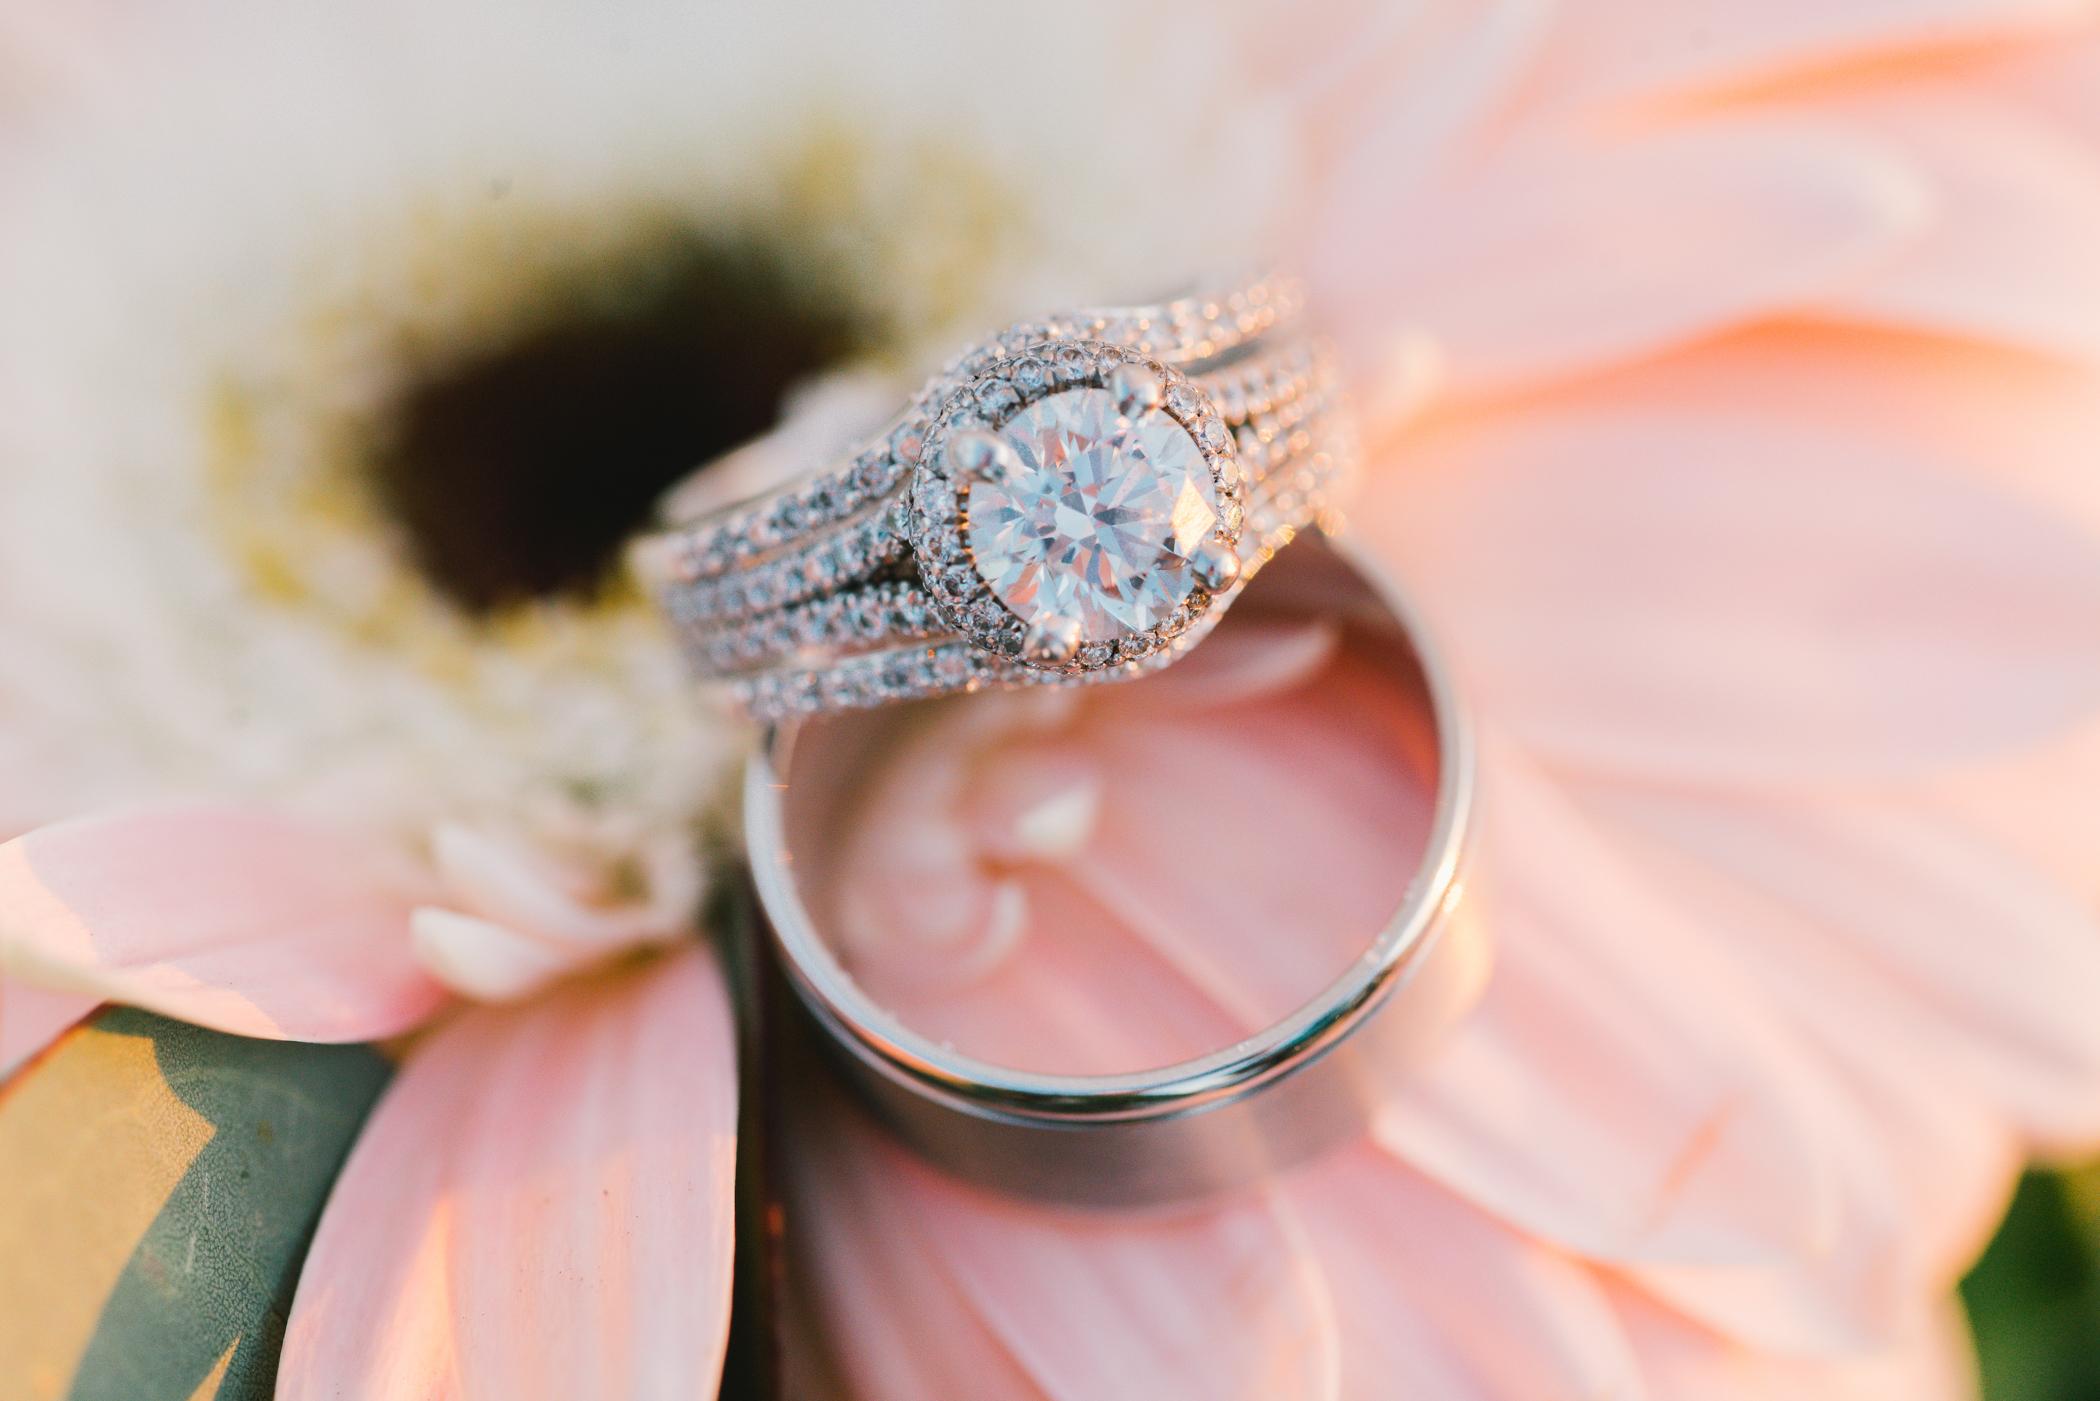 Lido-key-beach-wedding, Beach-wedding-details, ring-shot